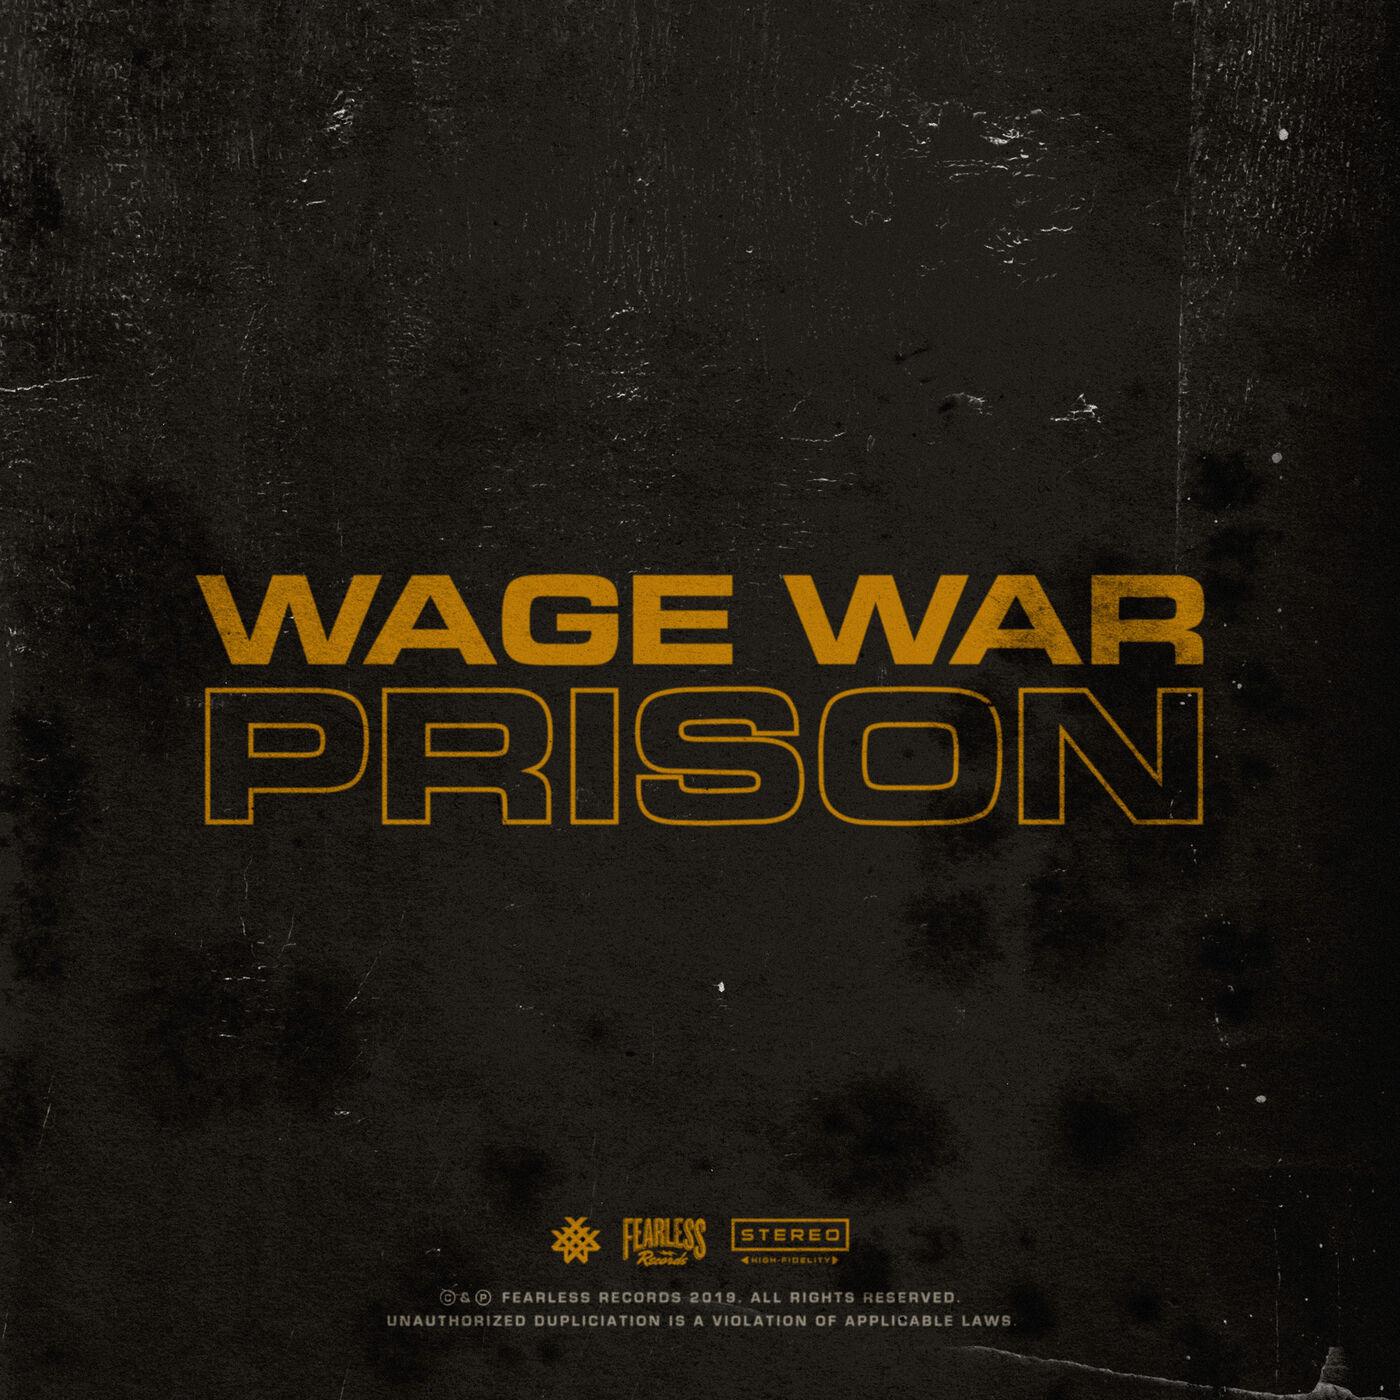 Wage War - Prison [single] (2019)